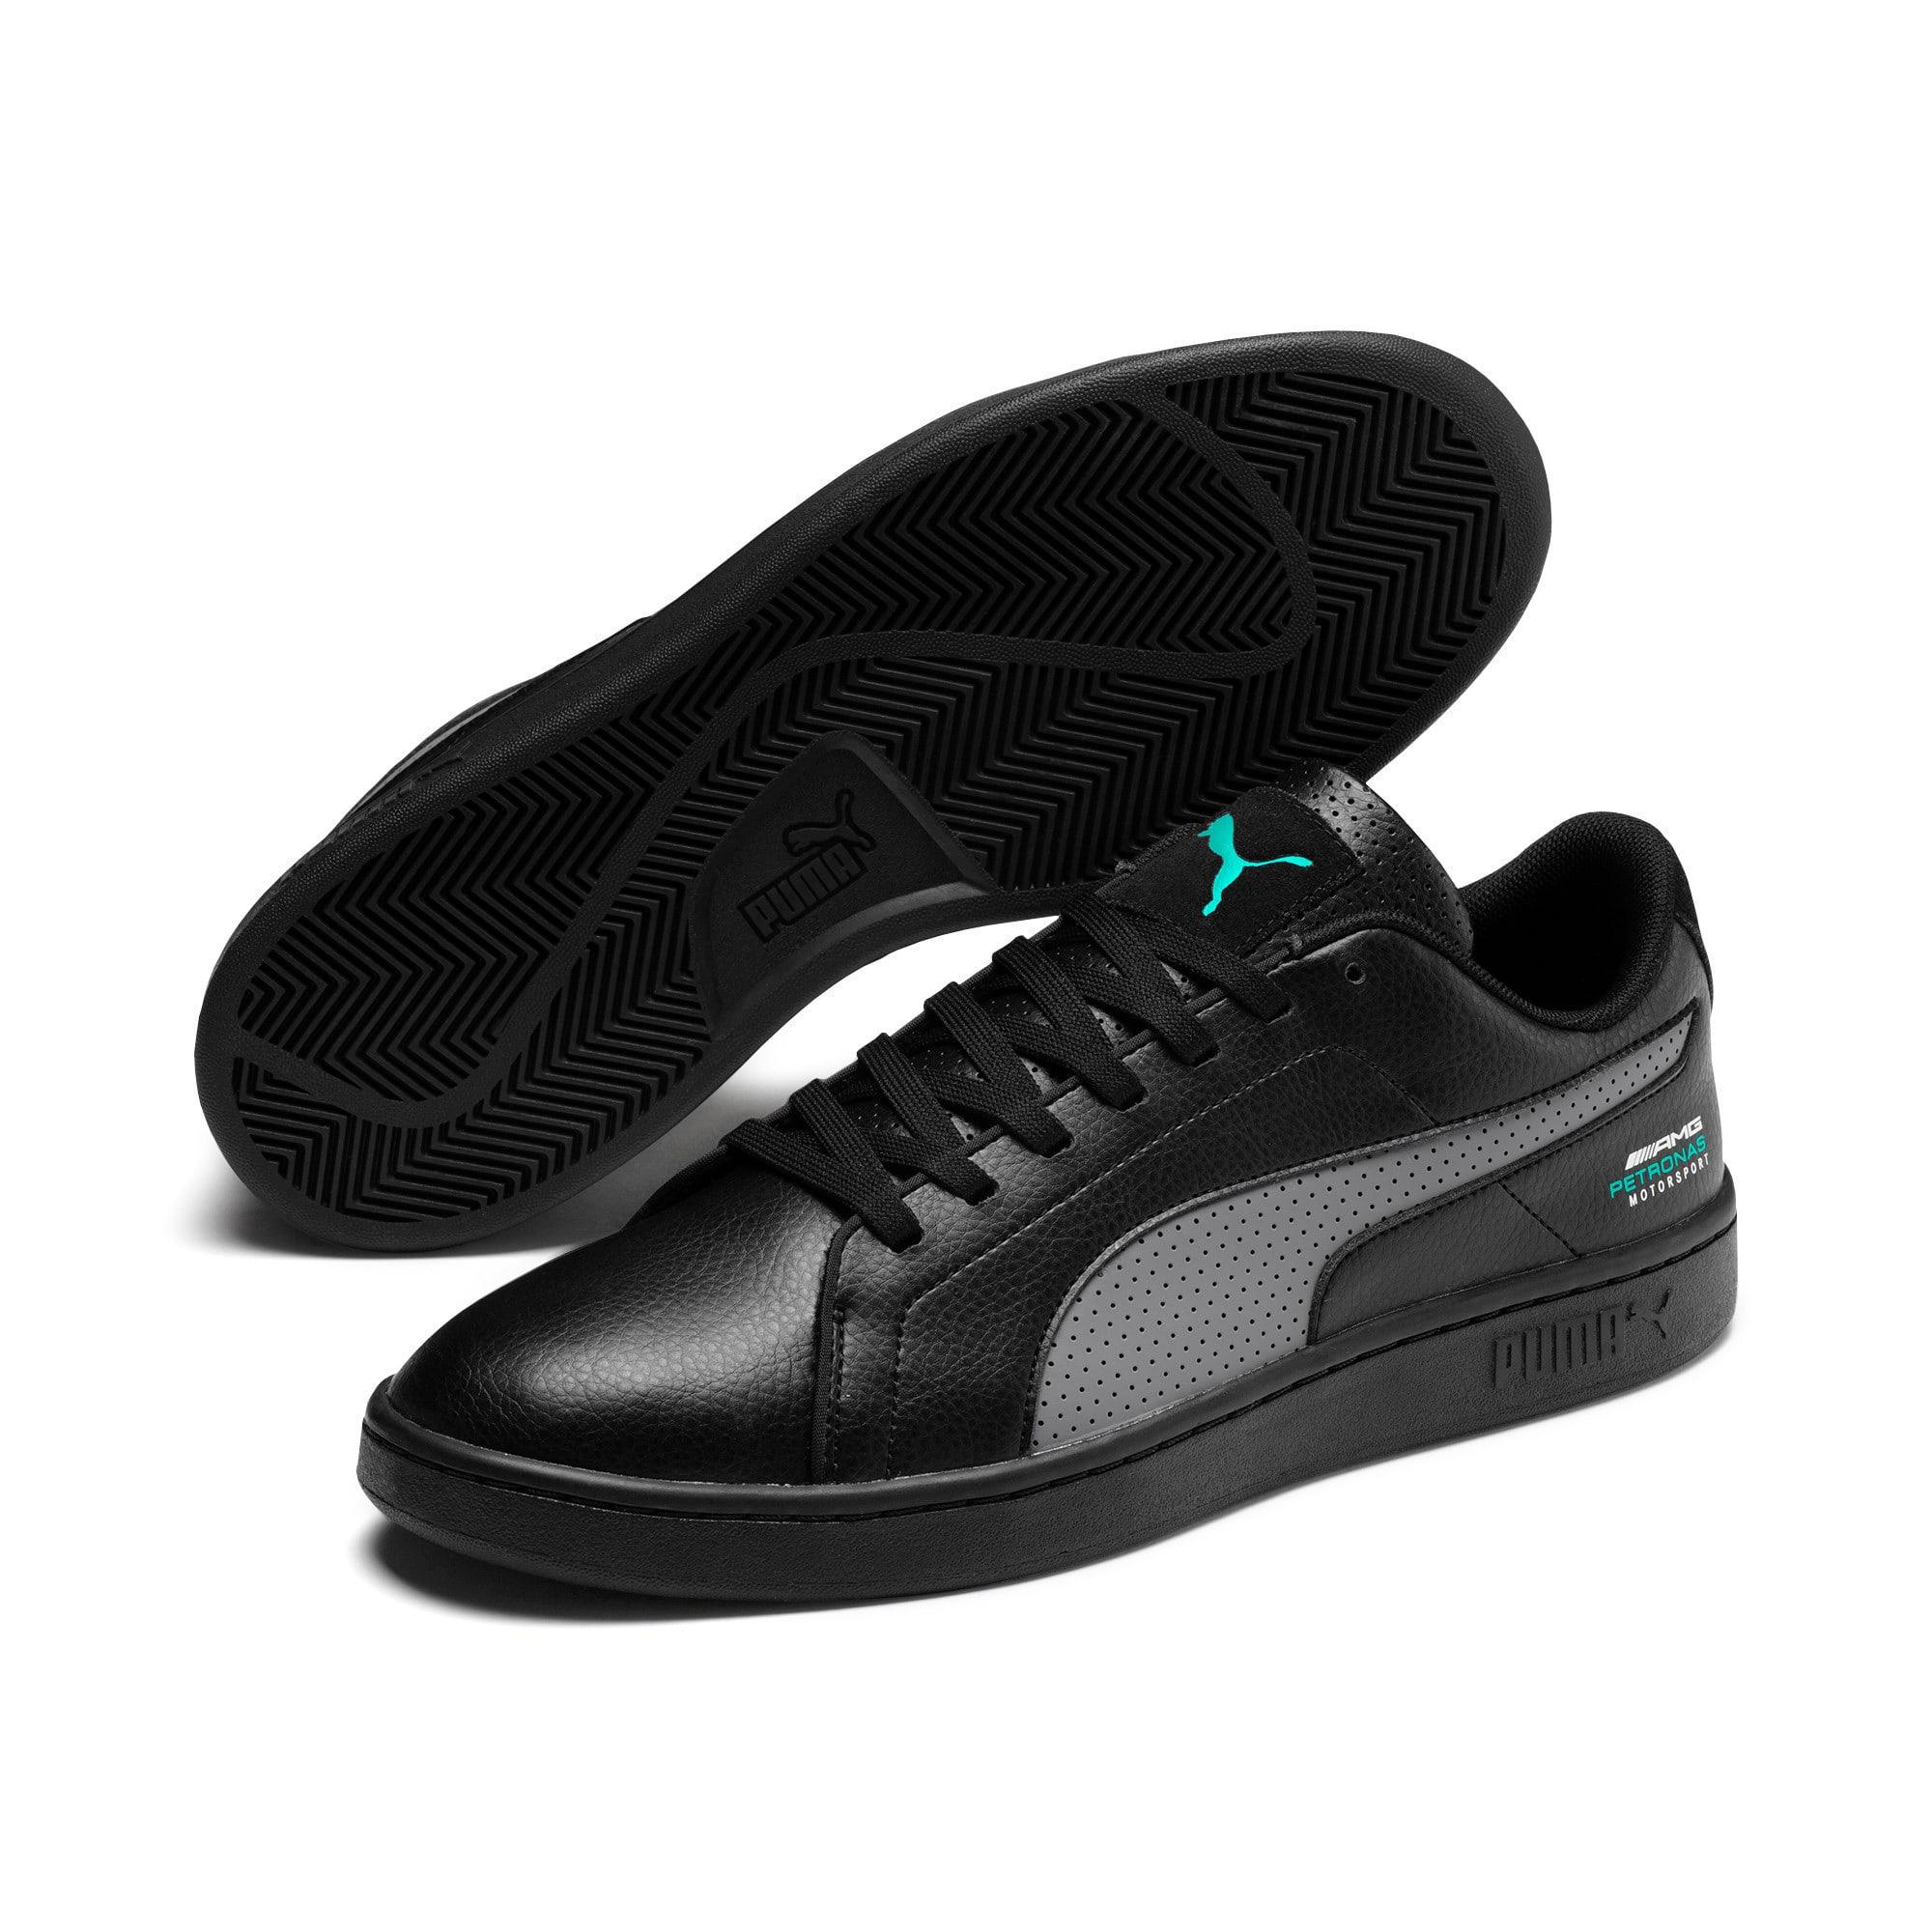 Thumbnail 3 of Mercedes AMG Petronas Smash v2 Sneakers, Black-Smkd Pearl-Spectra Grn, medium